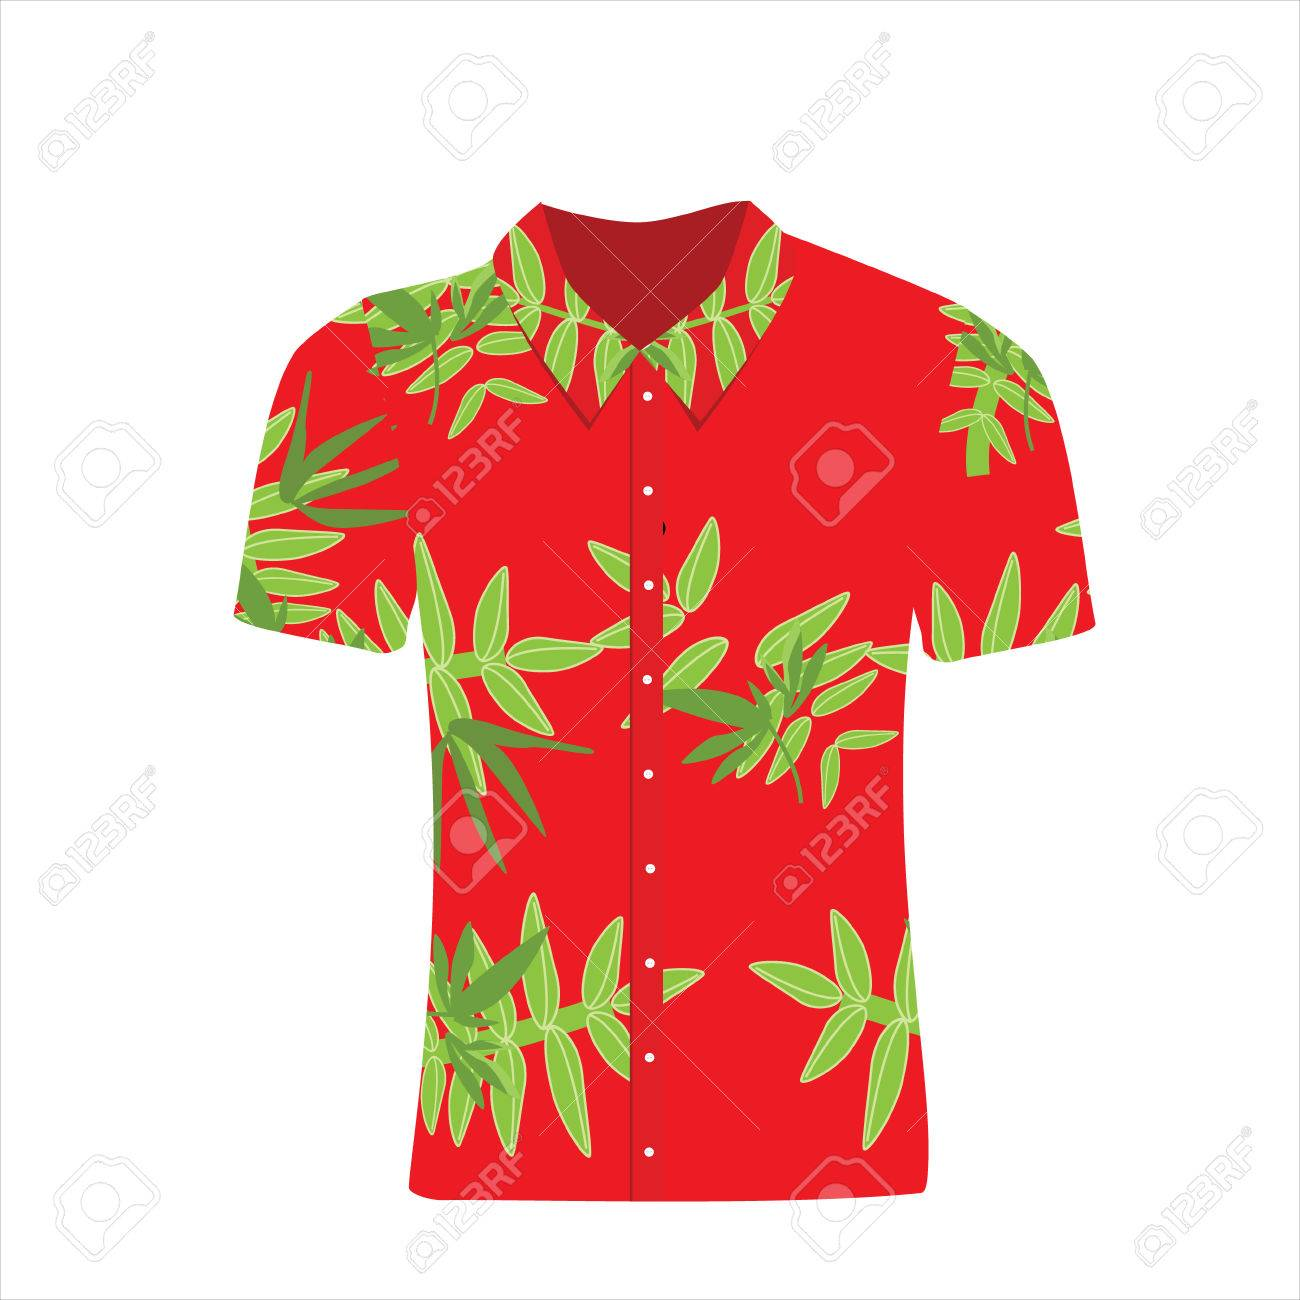 0d619ec5c Vector - Vector illustration Hawaiian aloha shirt. Beach male cloth. Hawaii  shirt adult clothing pattern design and modern flat hawaii shirt textile.